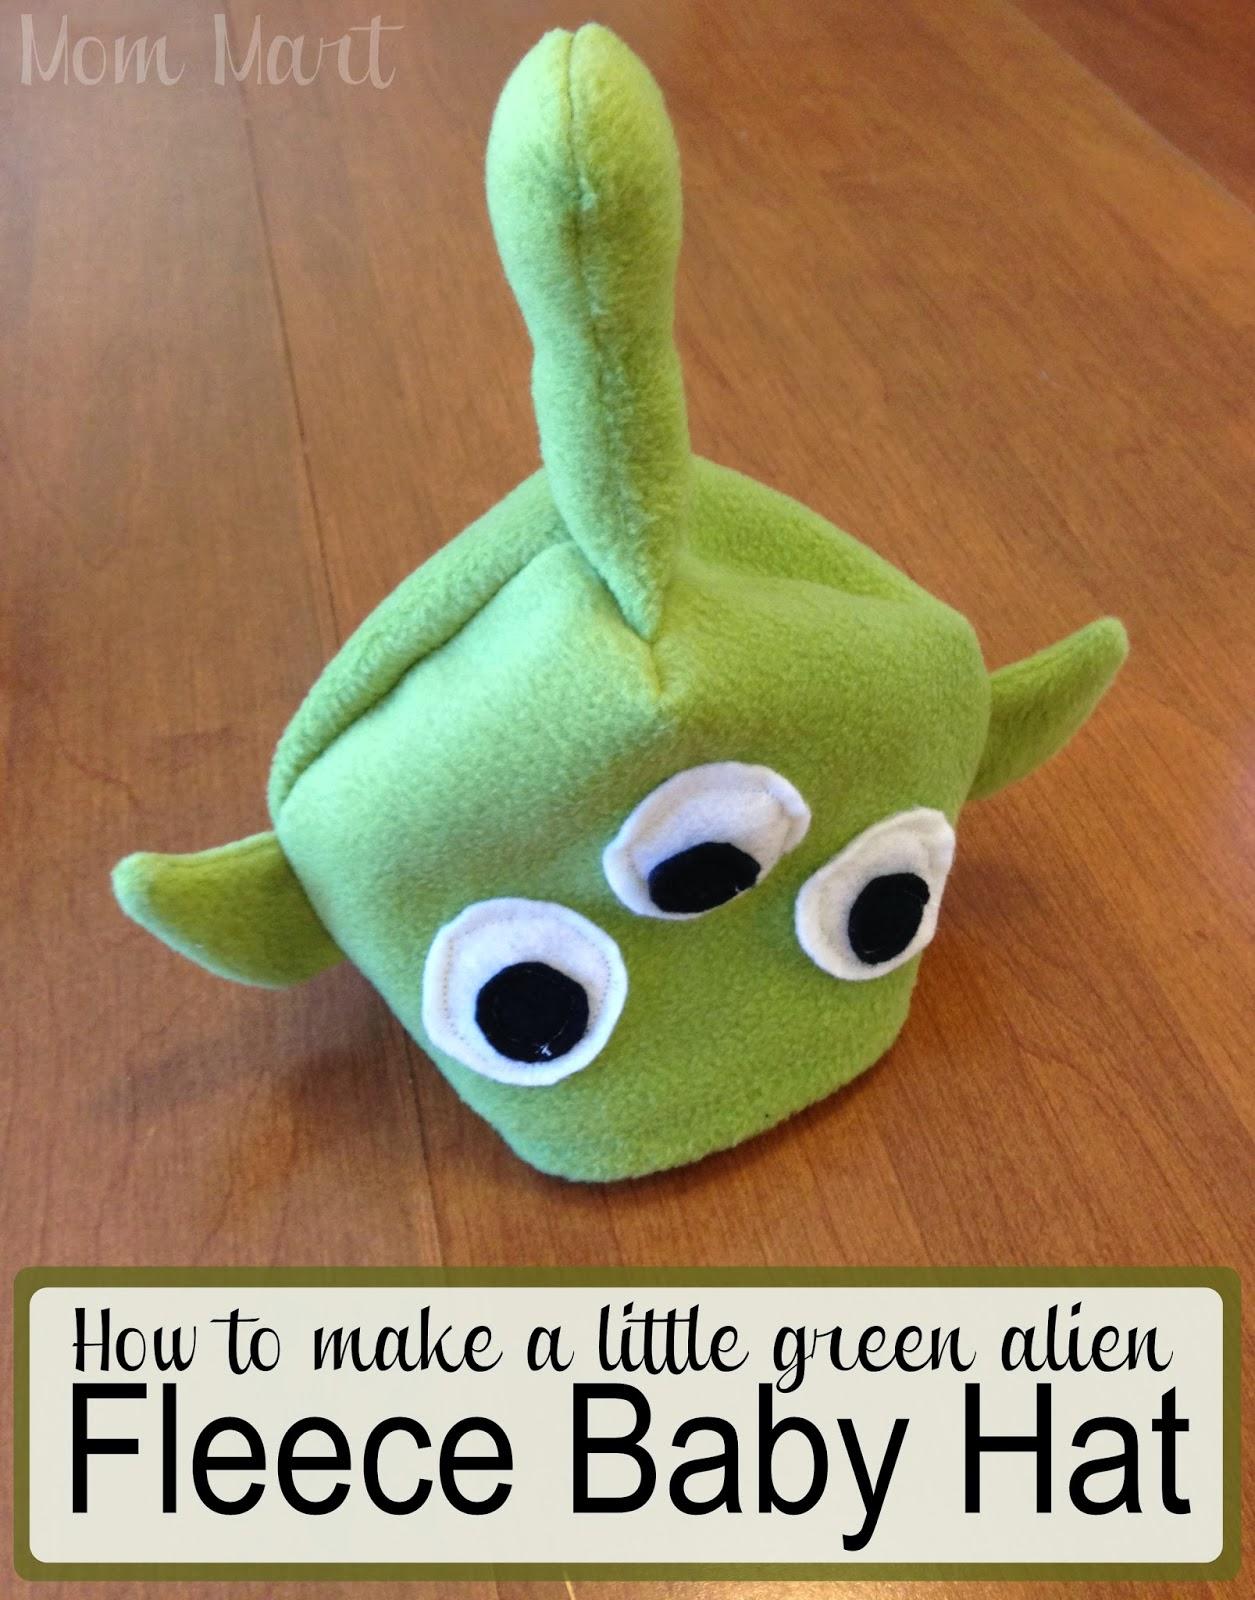 mom mart how to make a little green alien fleece baby hat. Black Bedroom Furniture Sets. Home Design Ideas